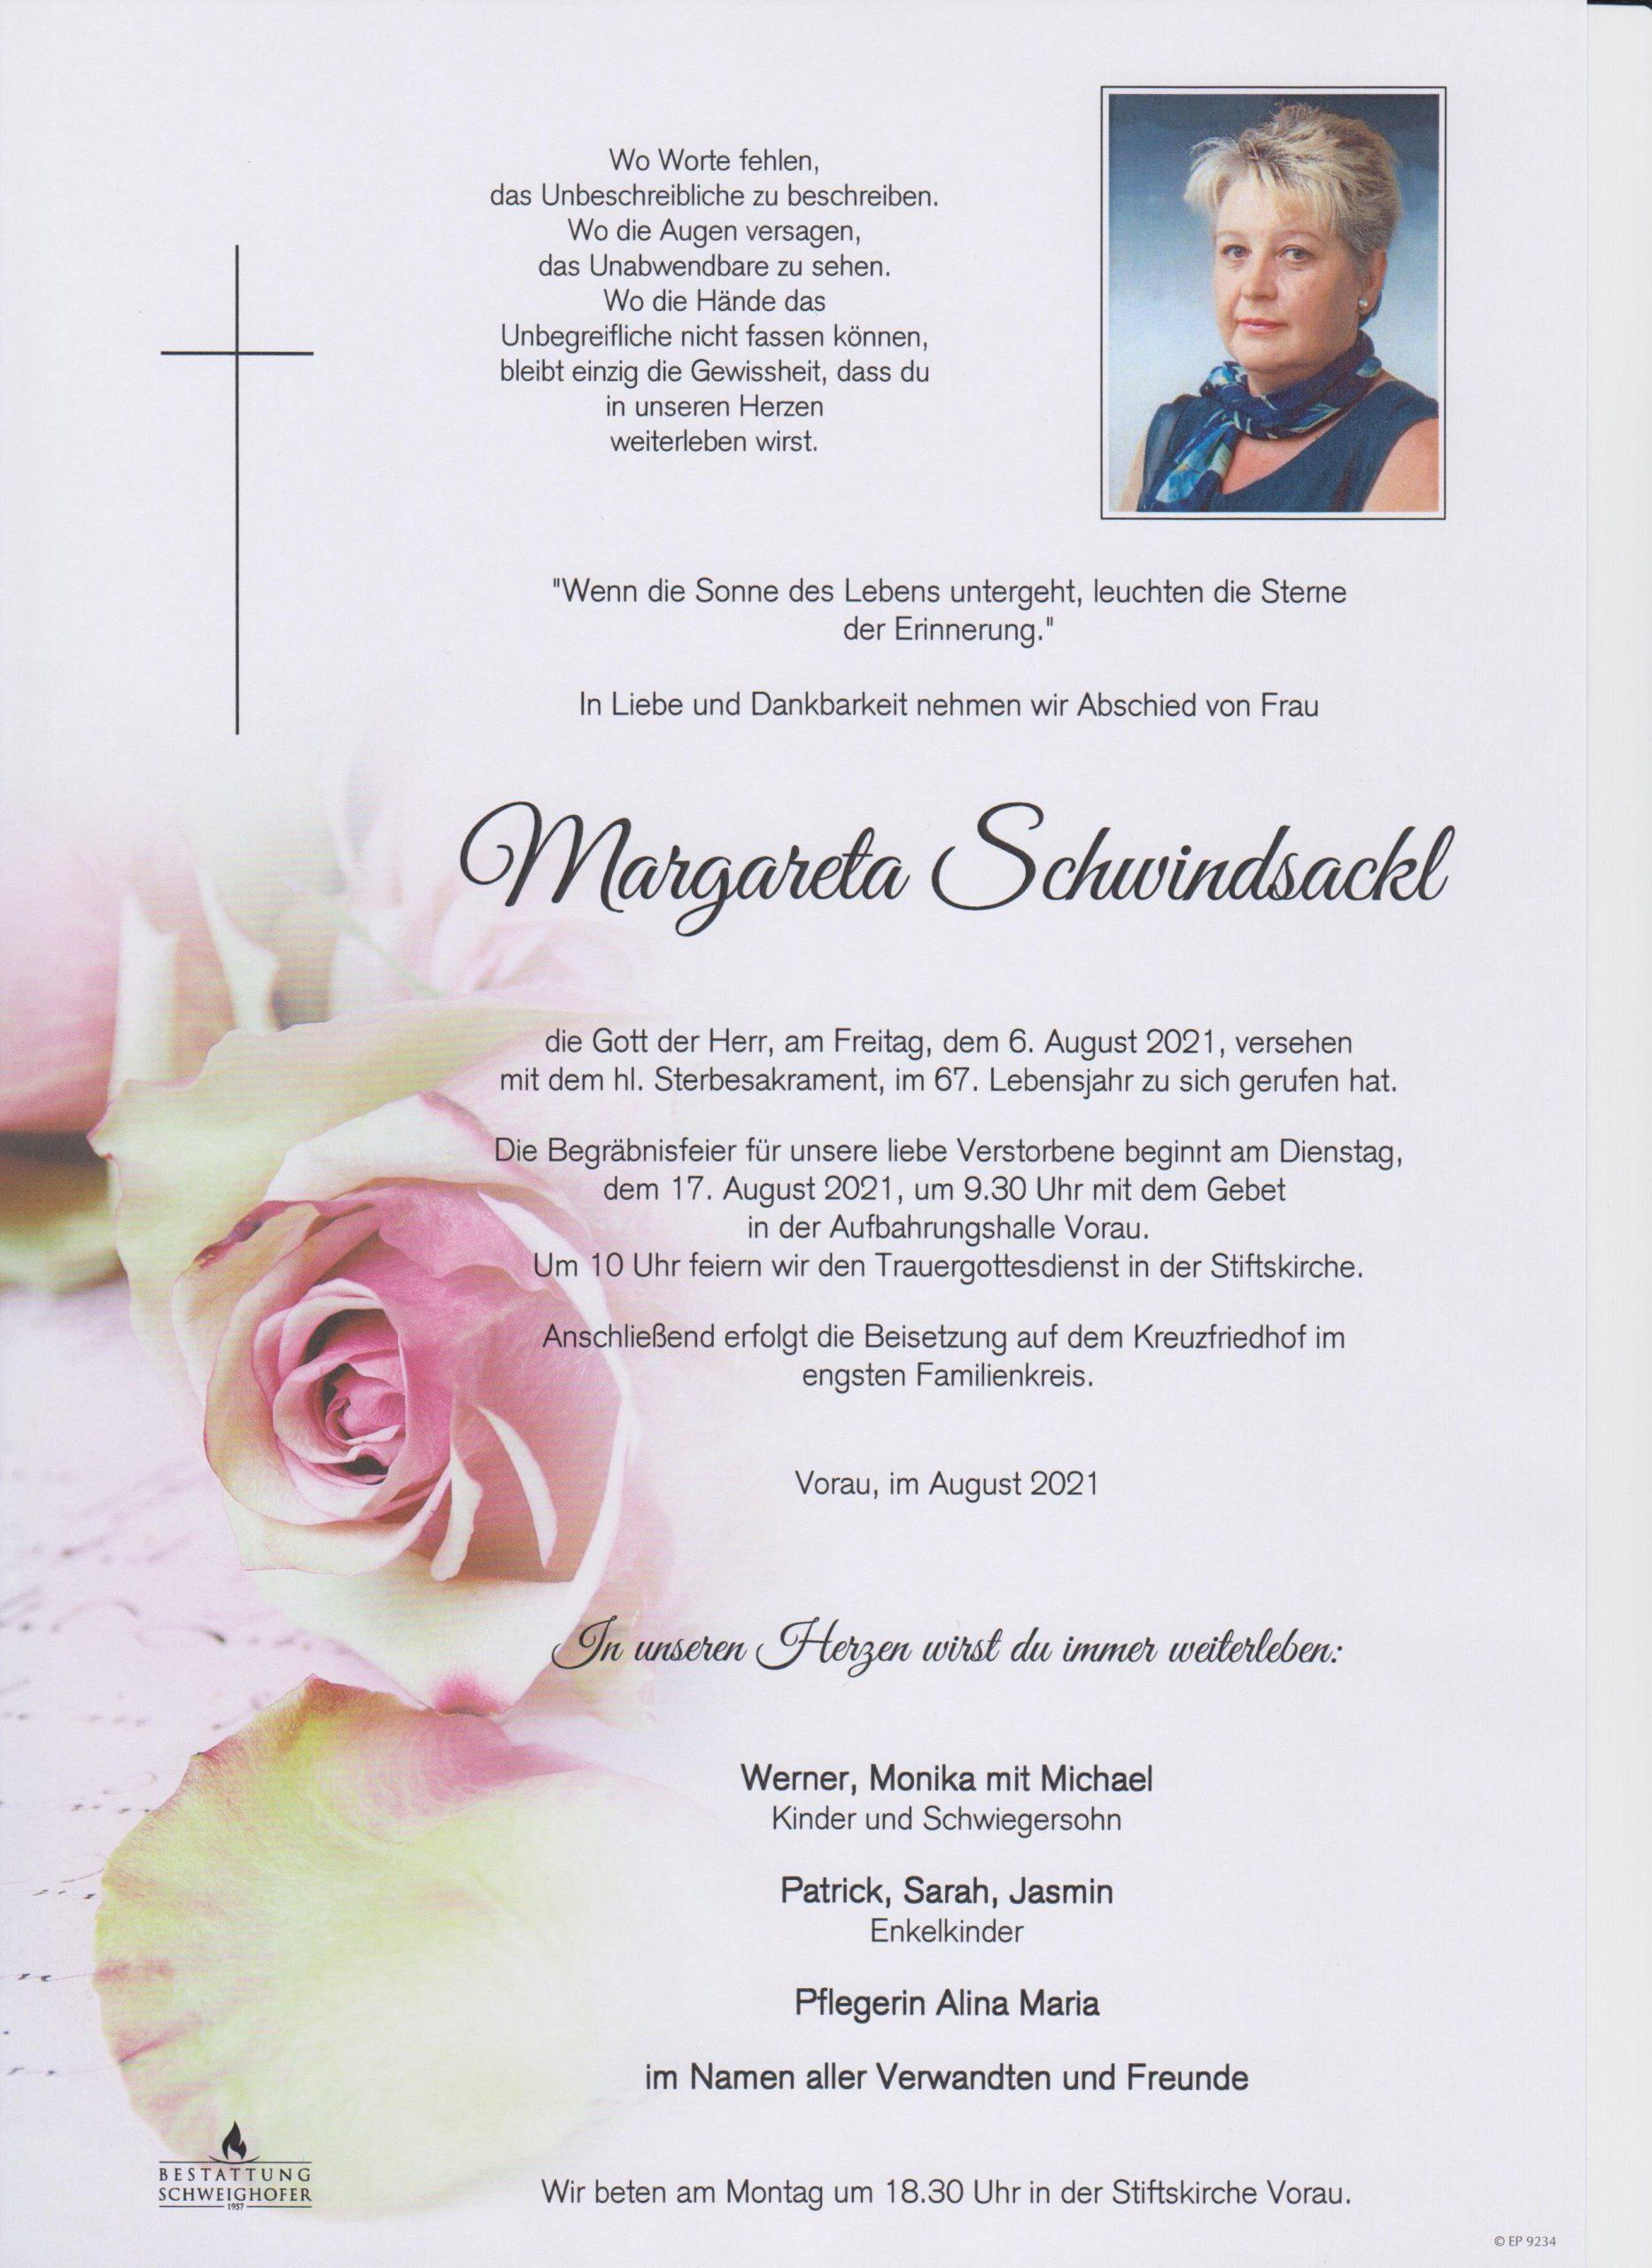 You are currently viewing Margareta Schwindsackl